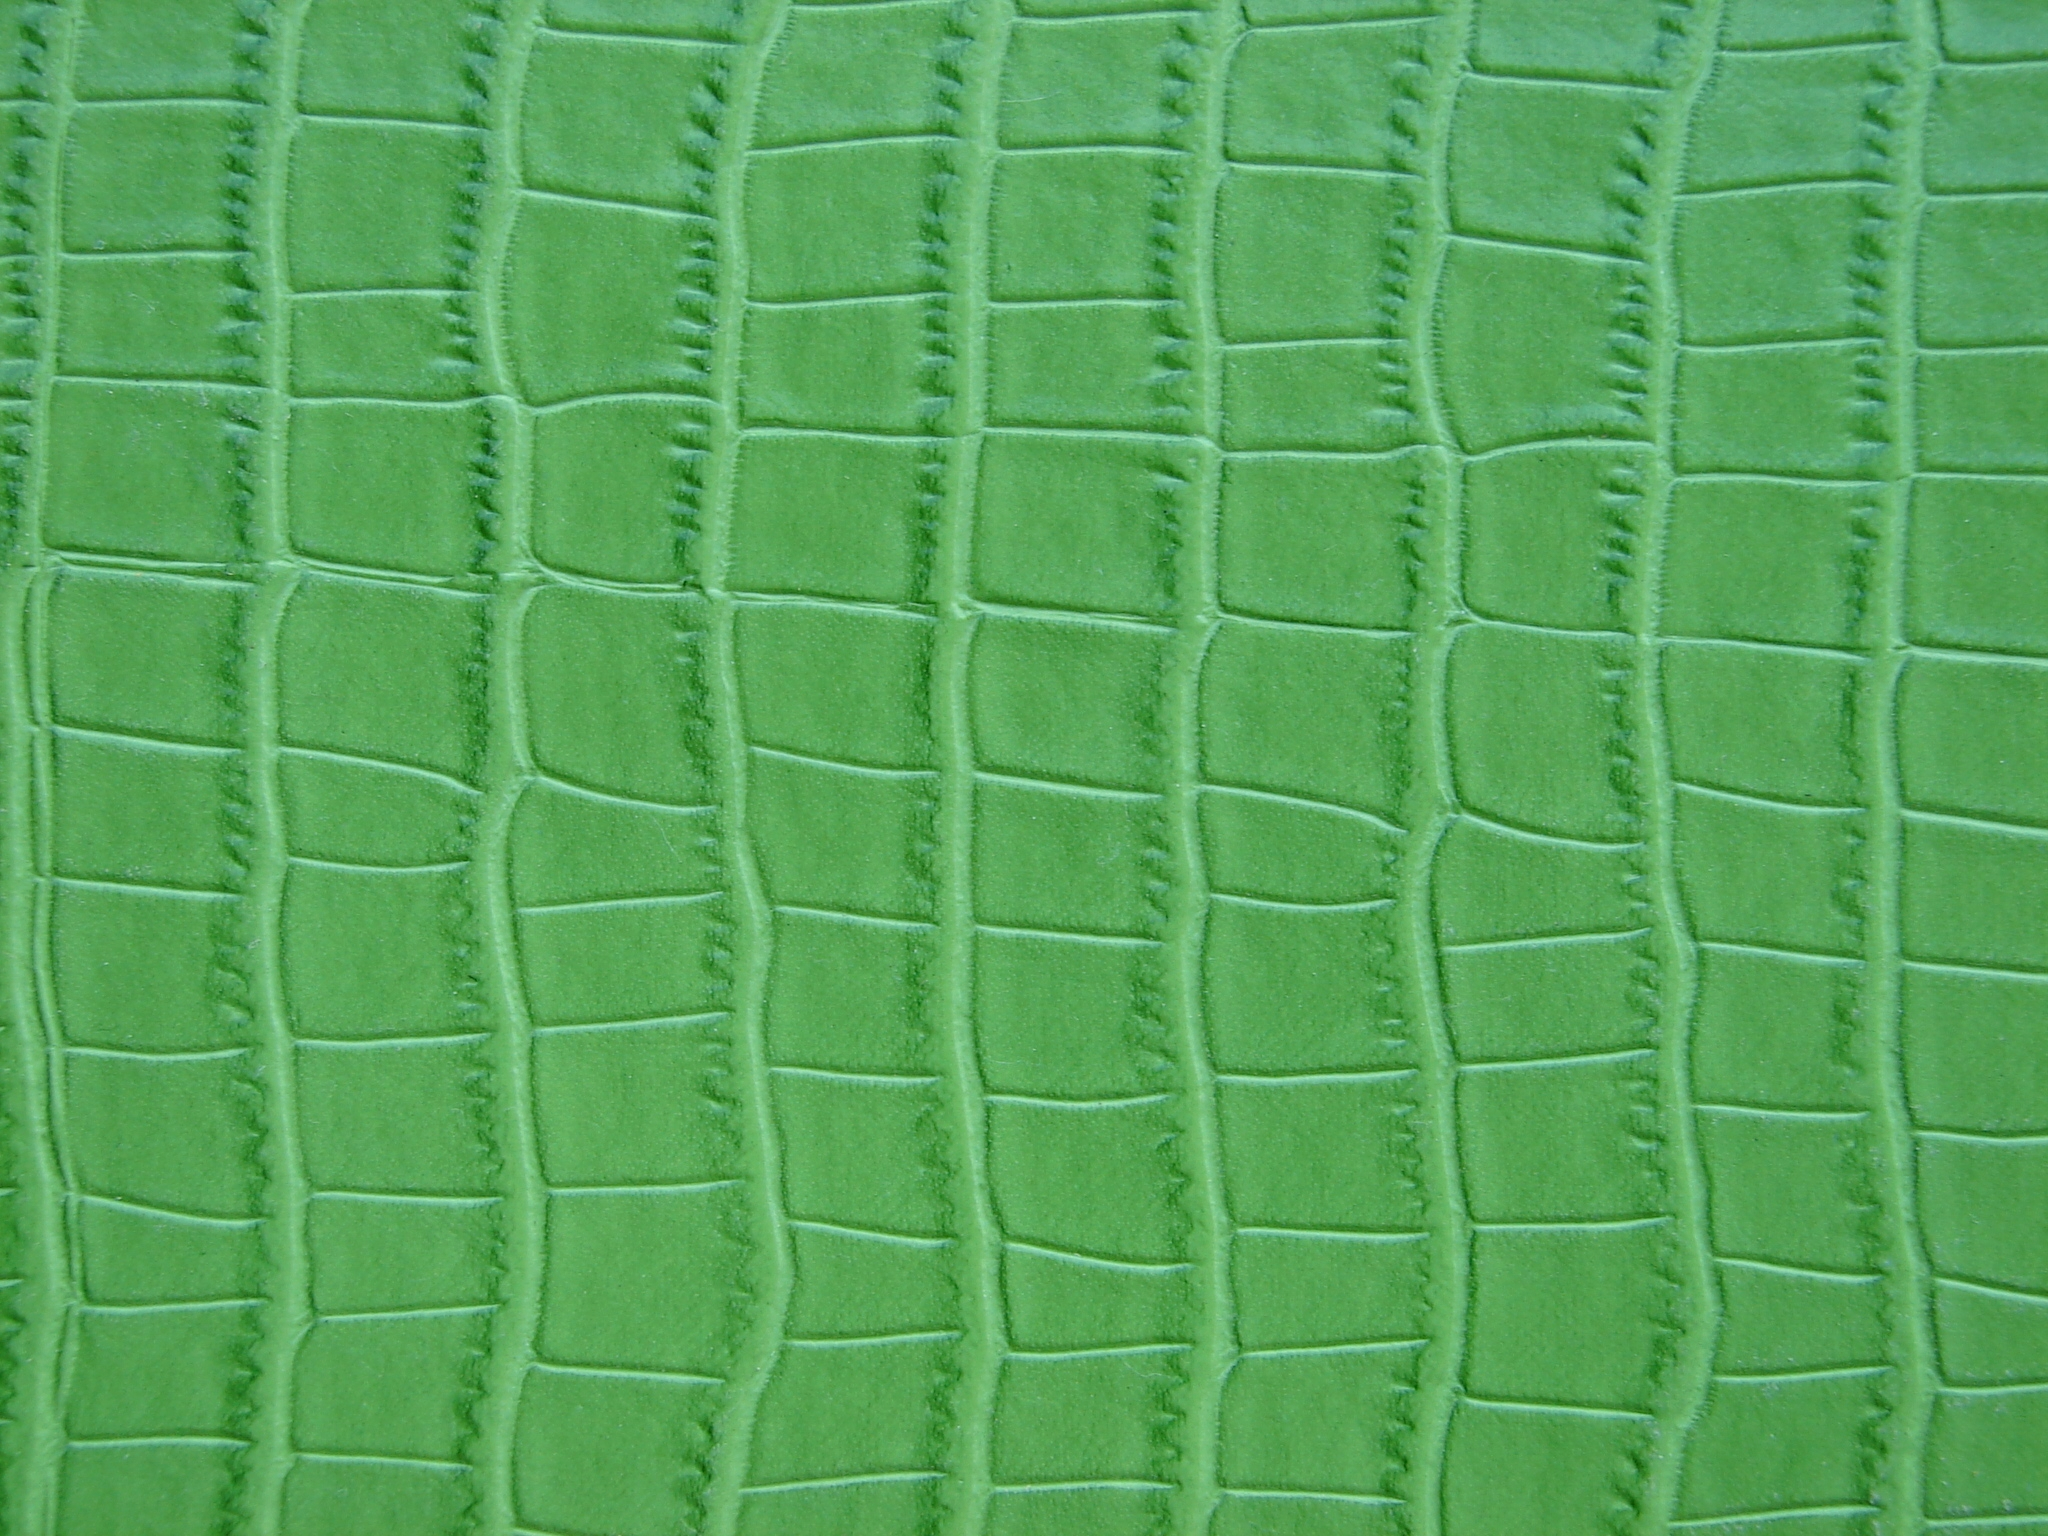 Fake Alligator Skin Texture by FantasyStock 2048x1536